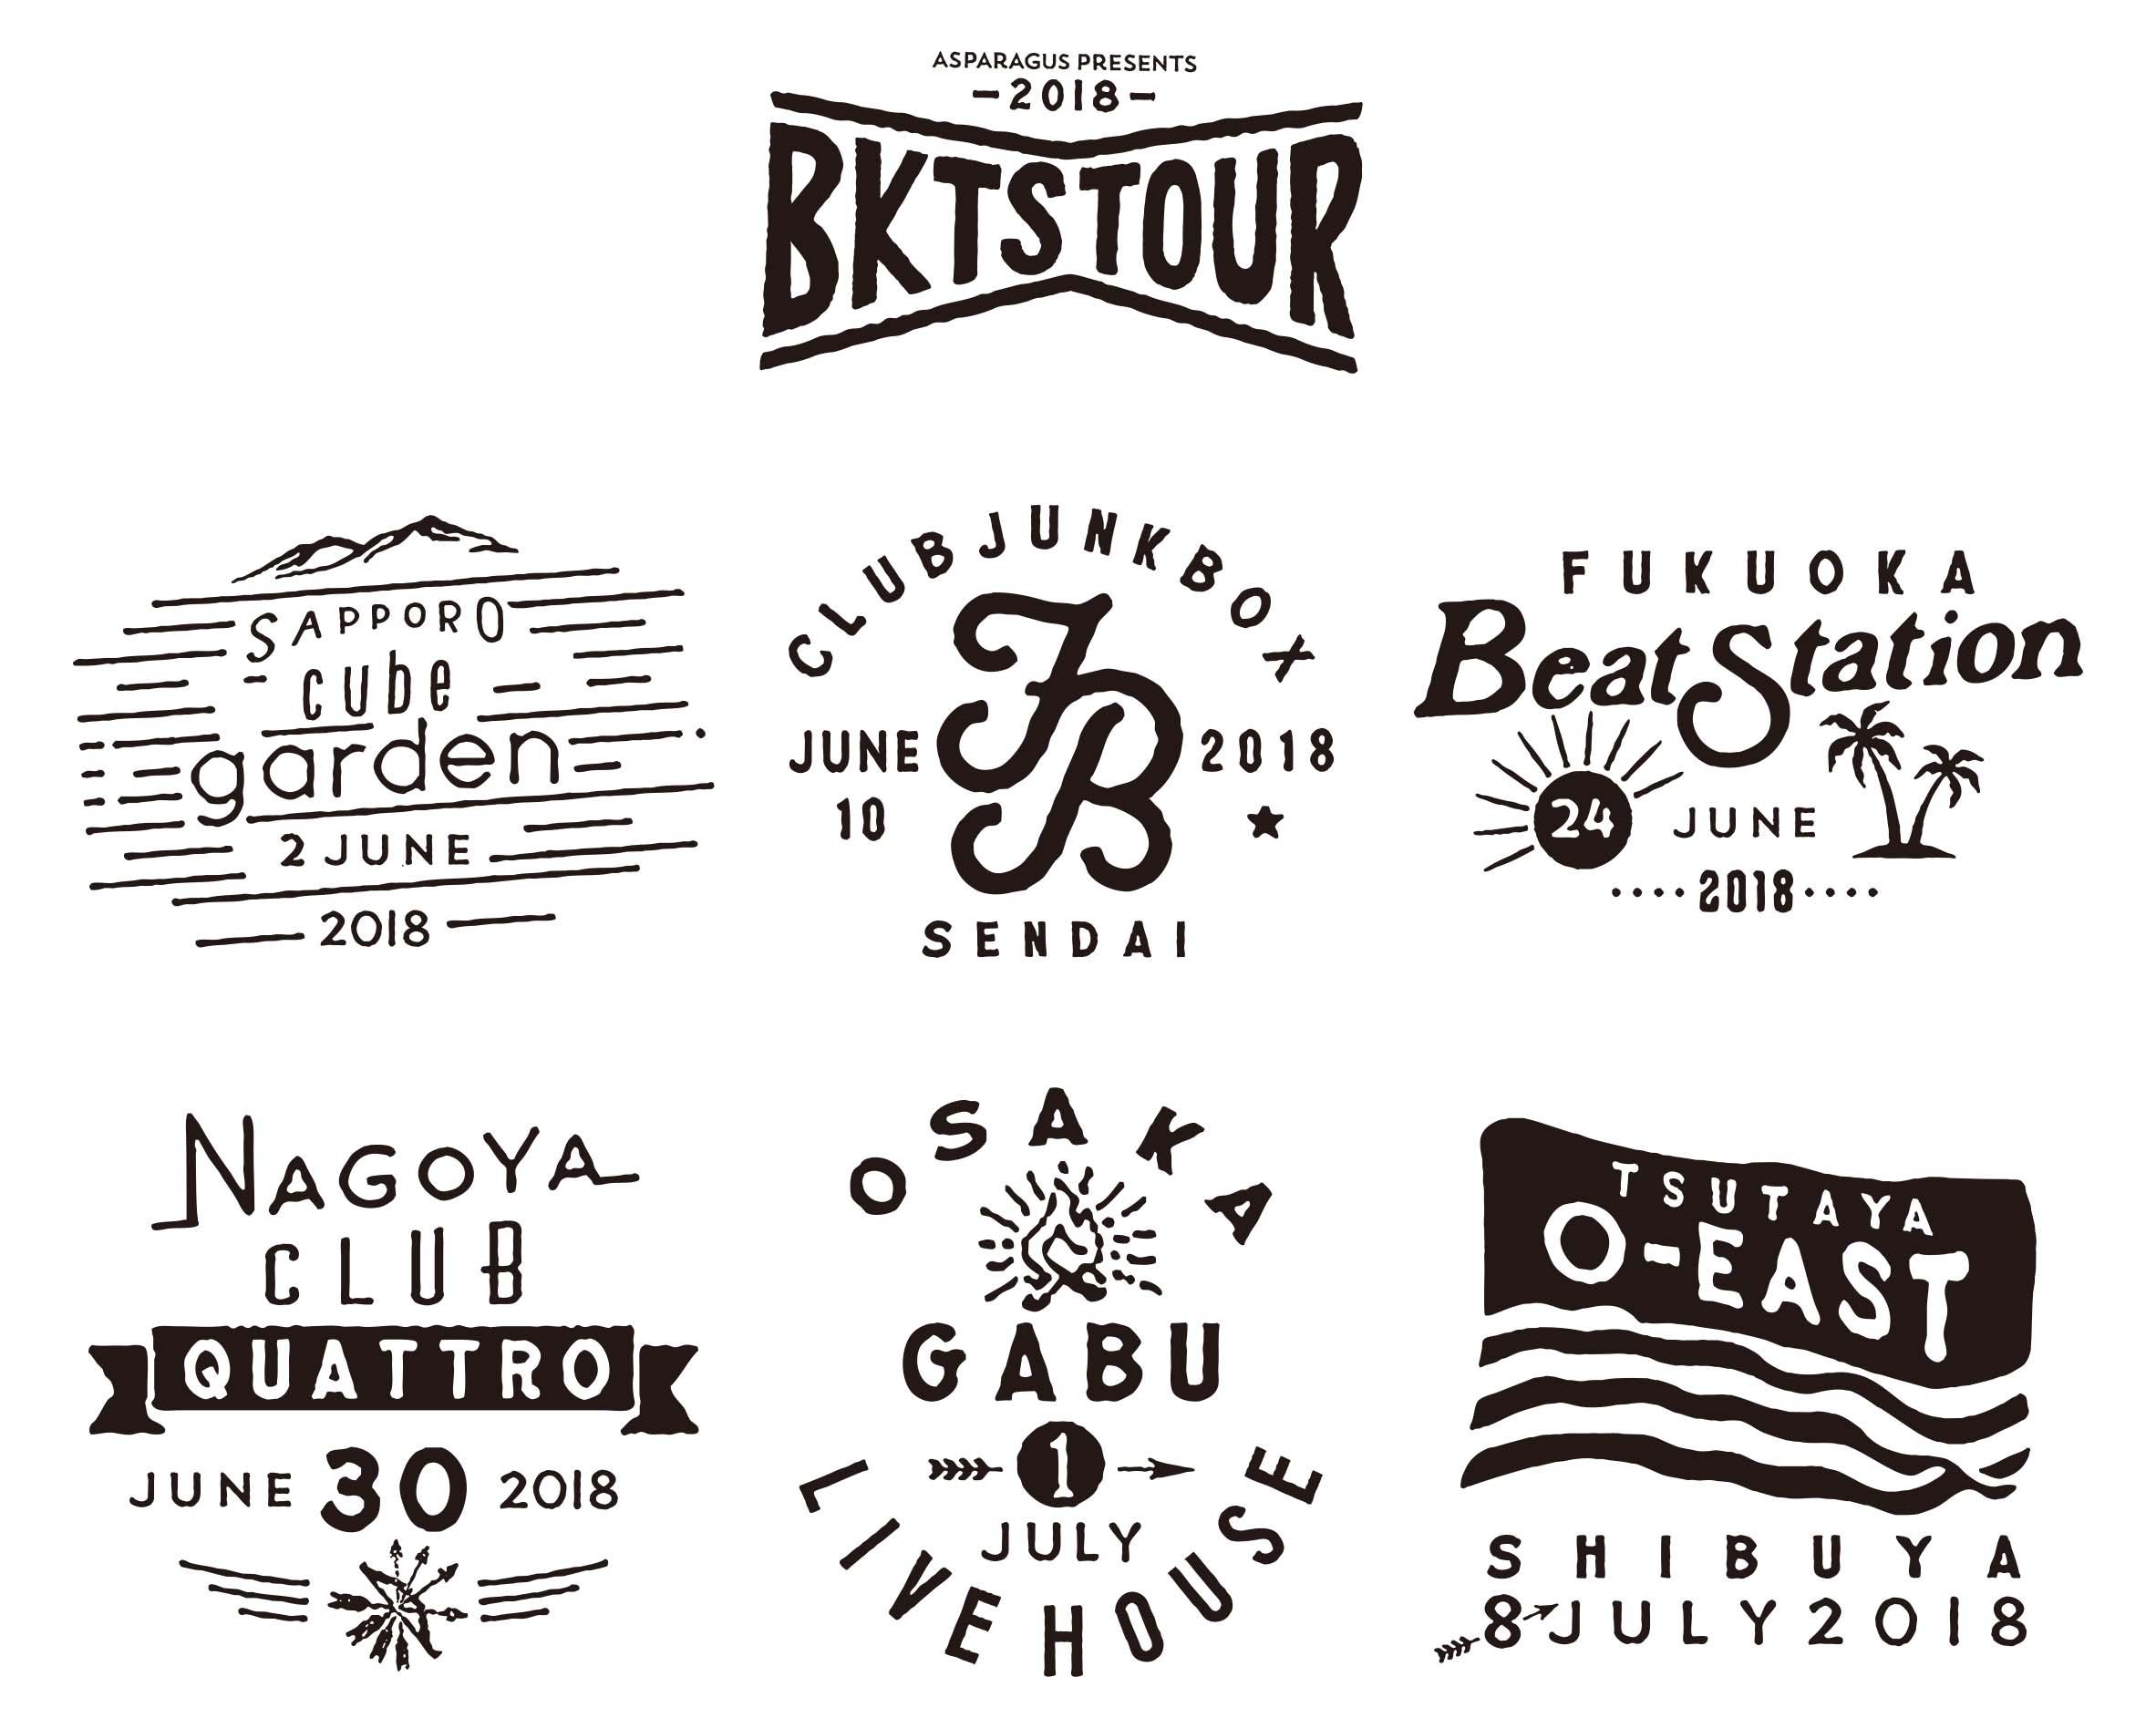 BKTS TOUR 2018